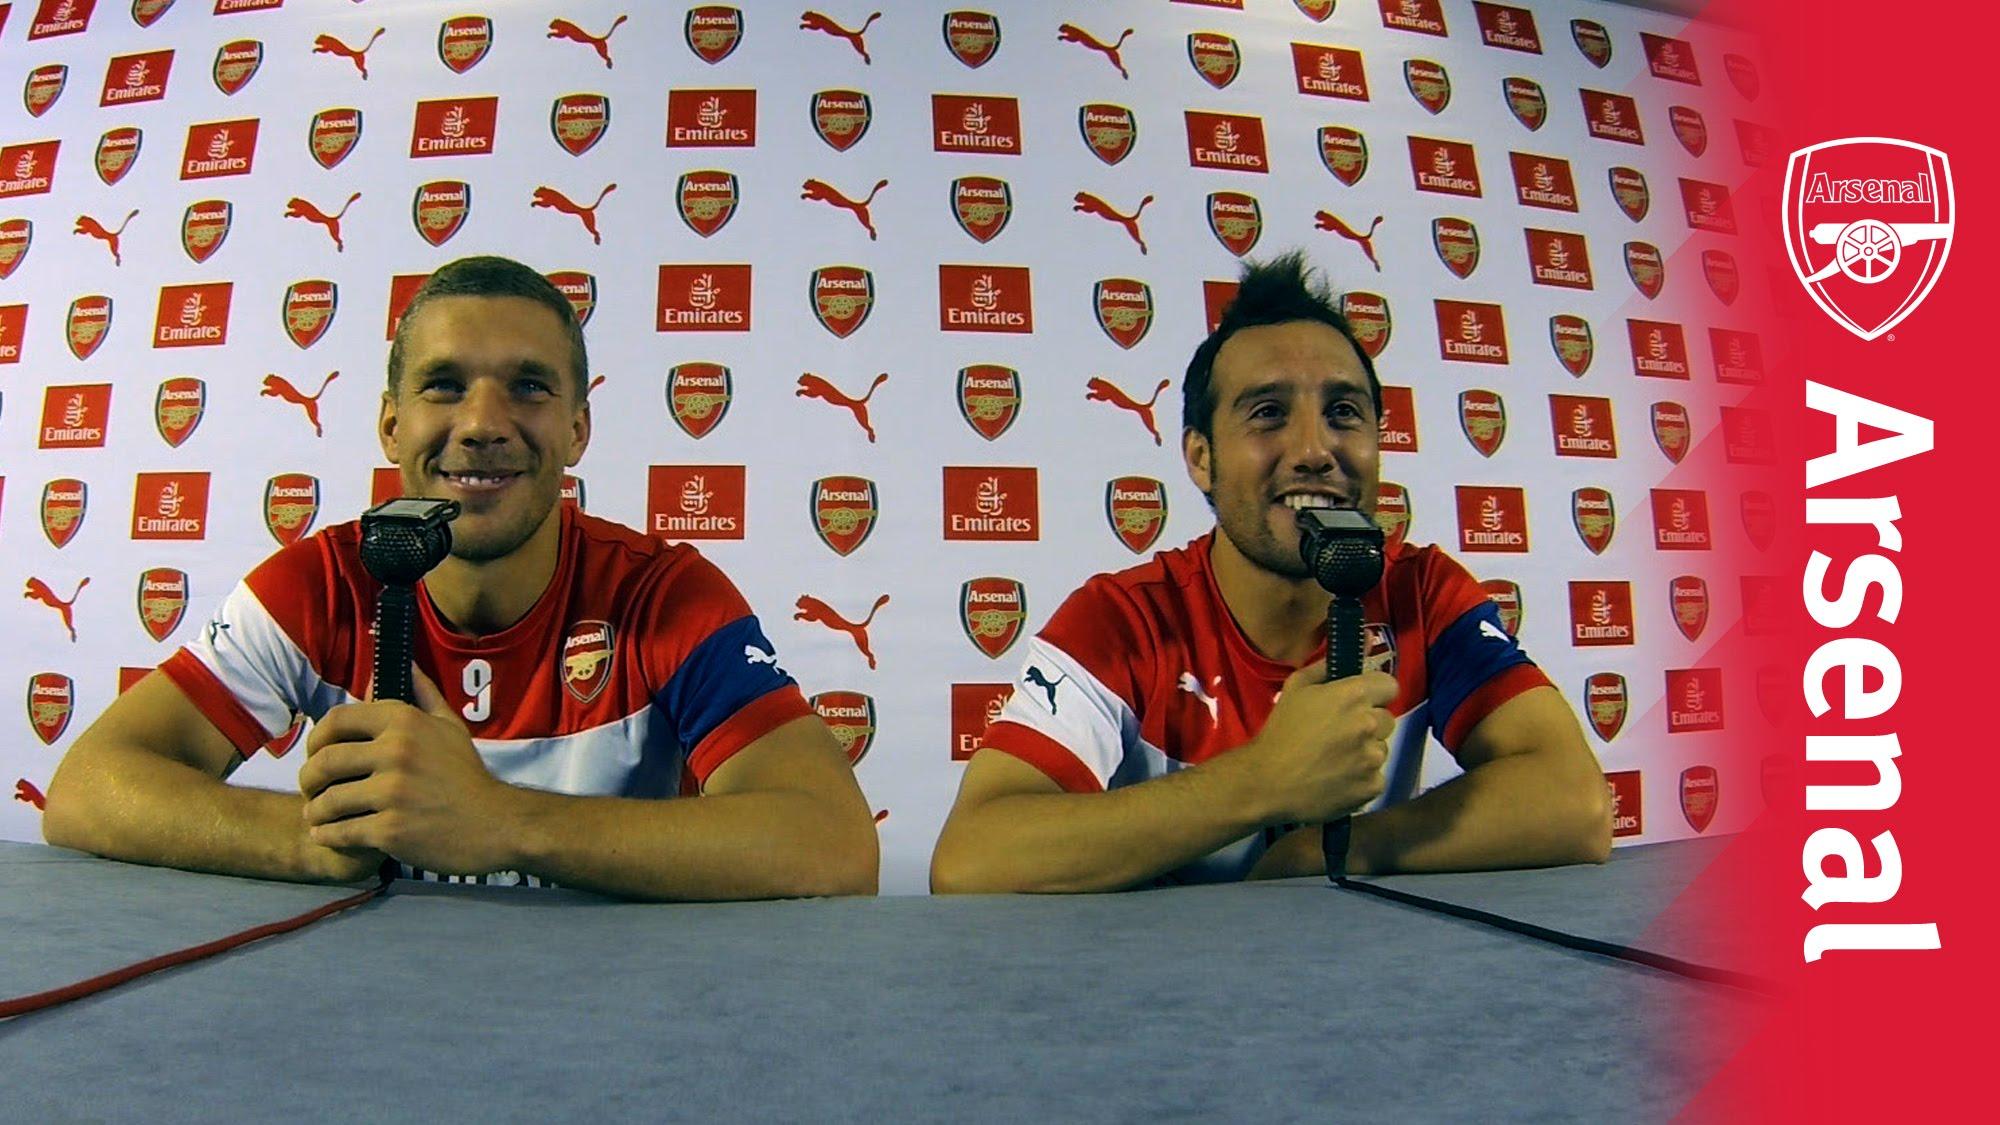 Podolski kommentiert Arsenal [Video]…